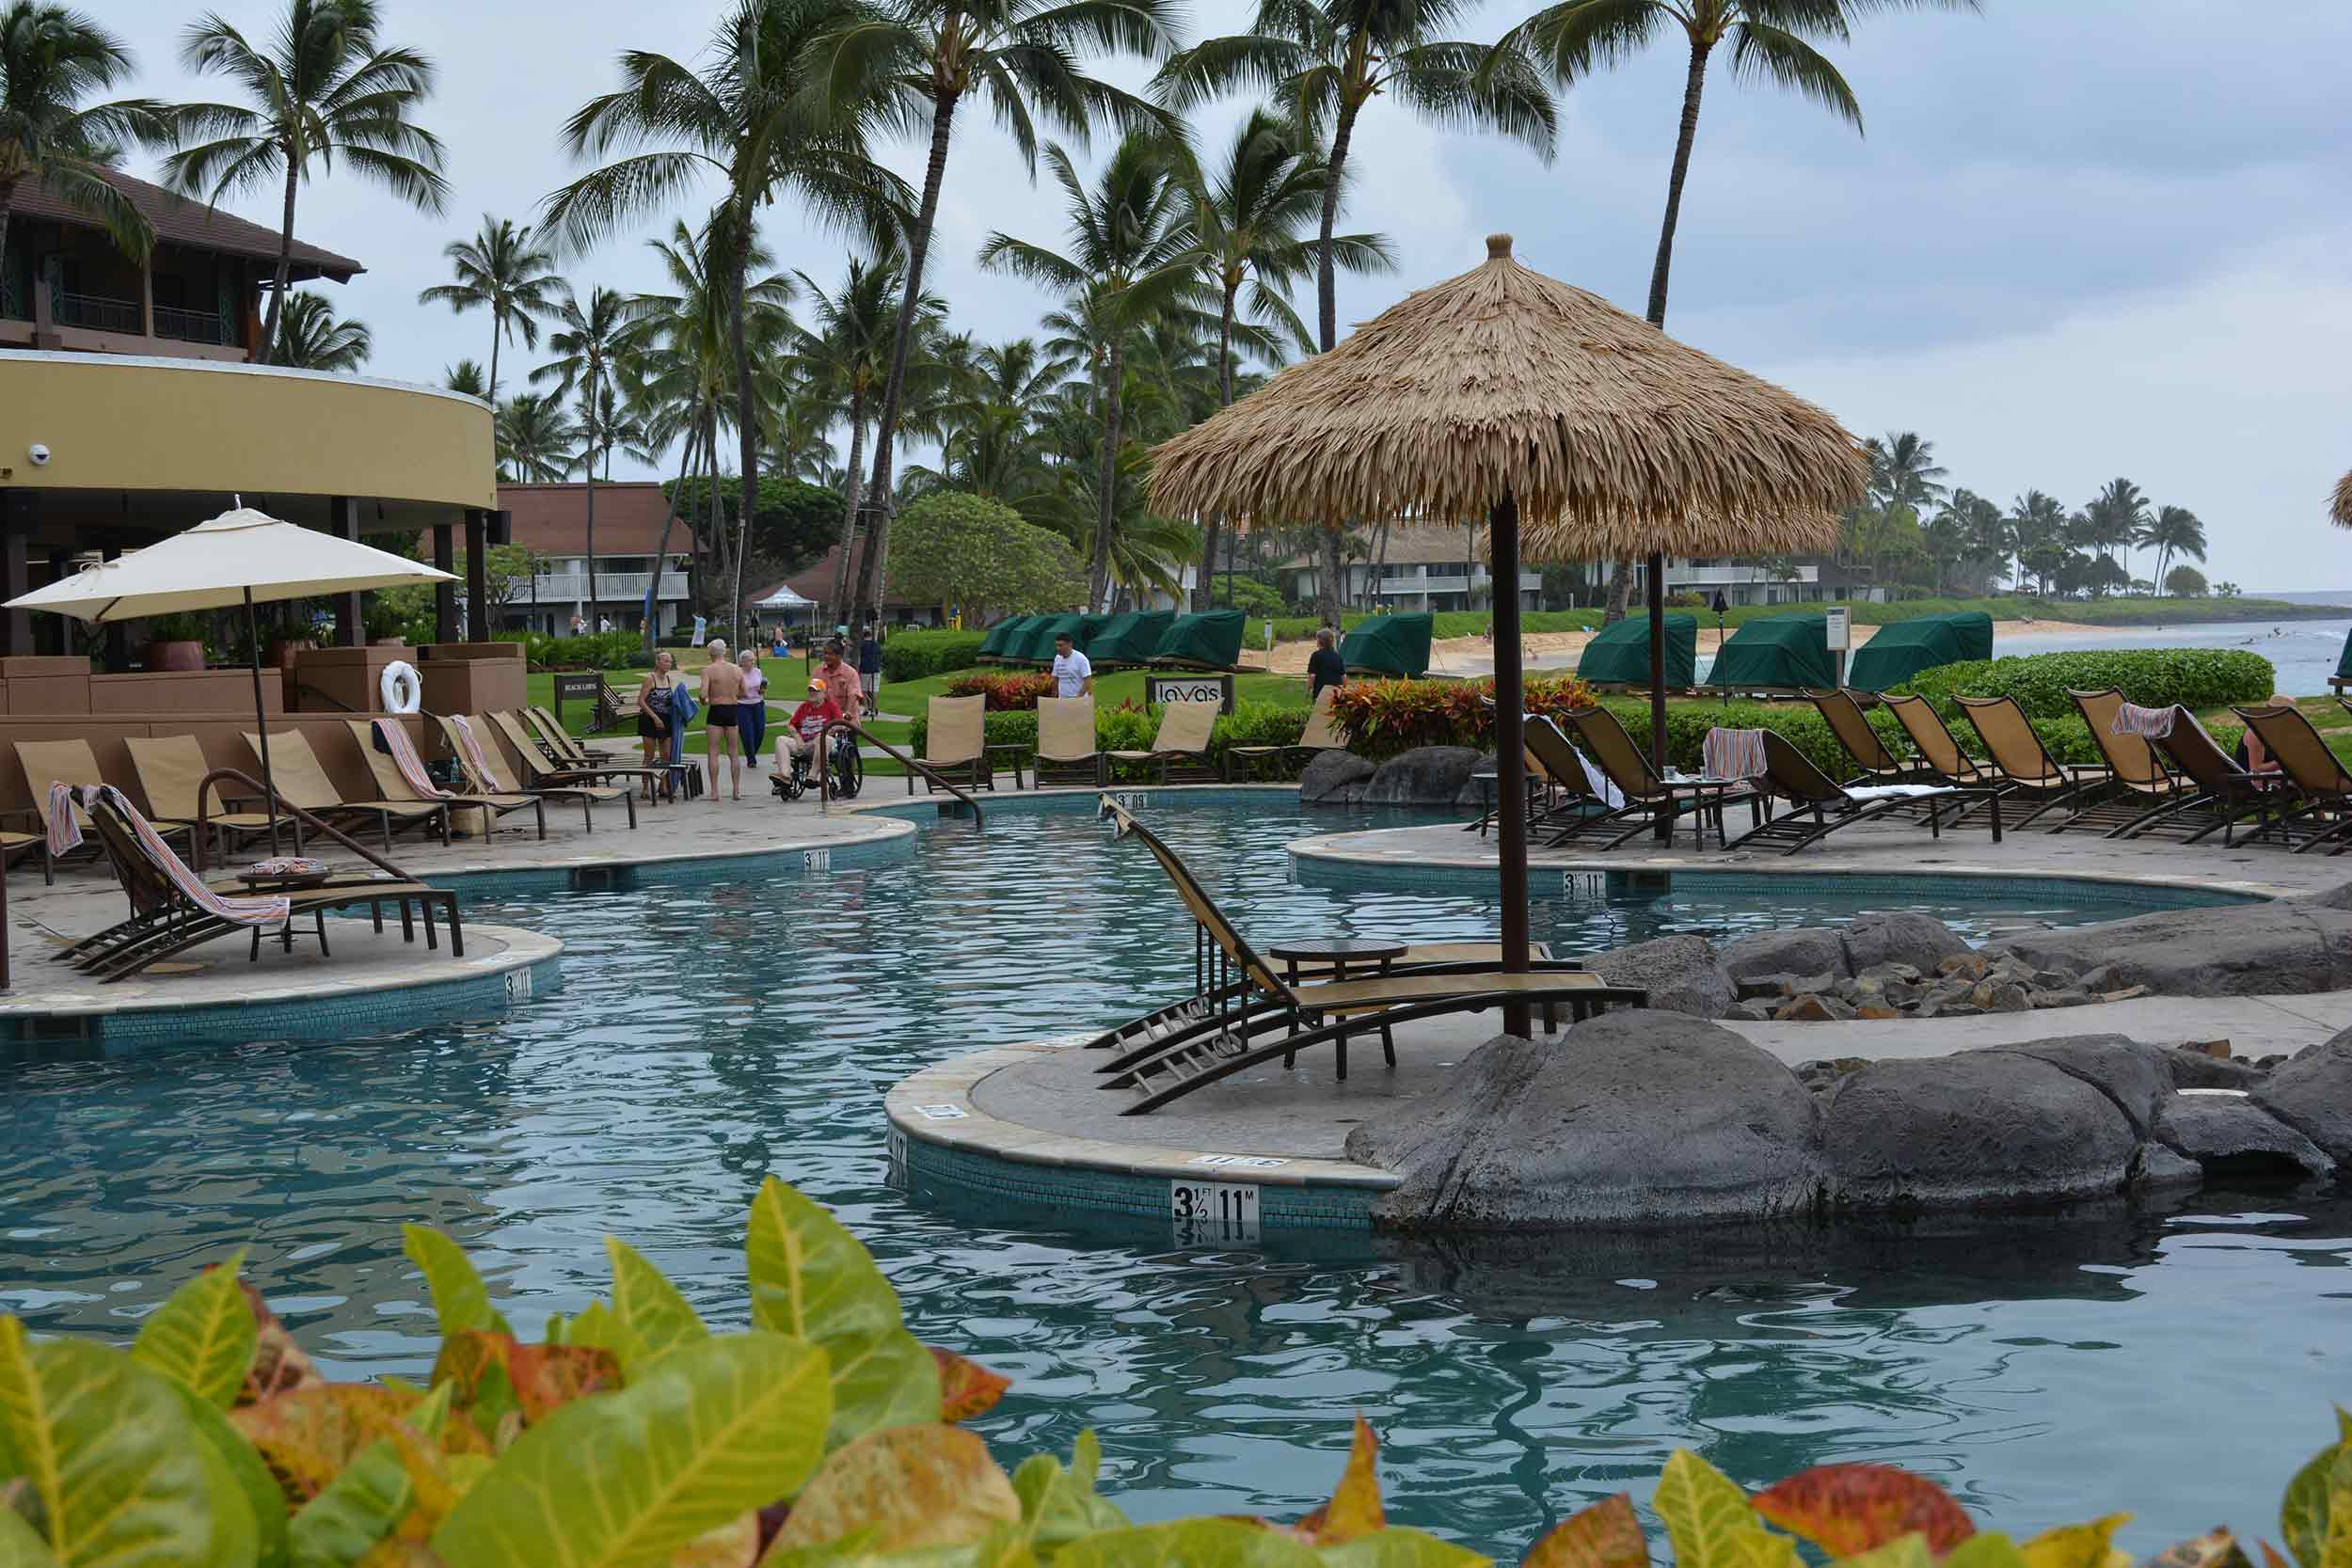 sheraton-kauai-resort-pool-landscaping-koloa-hi-2.jpg